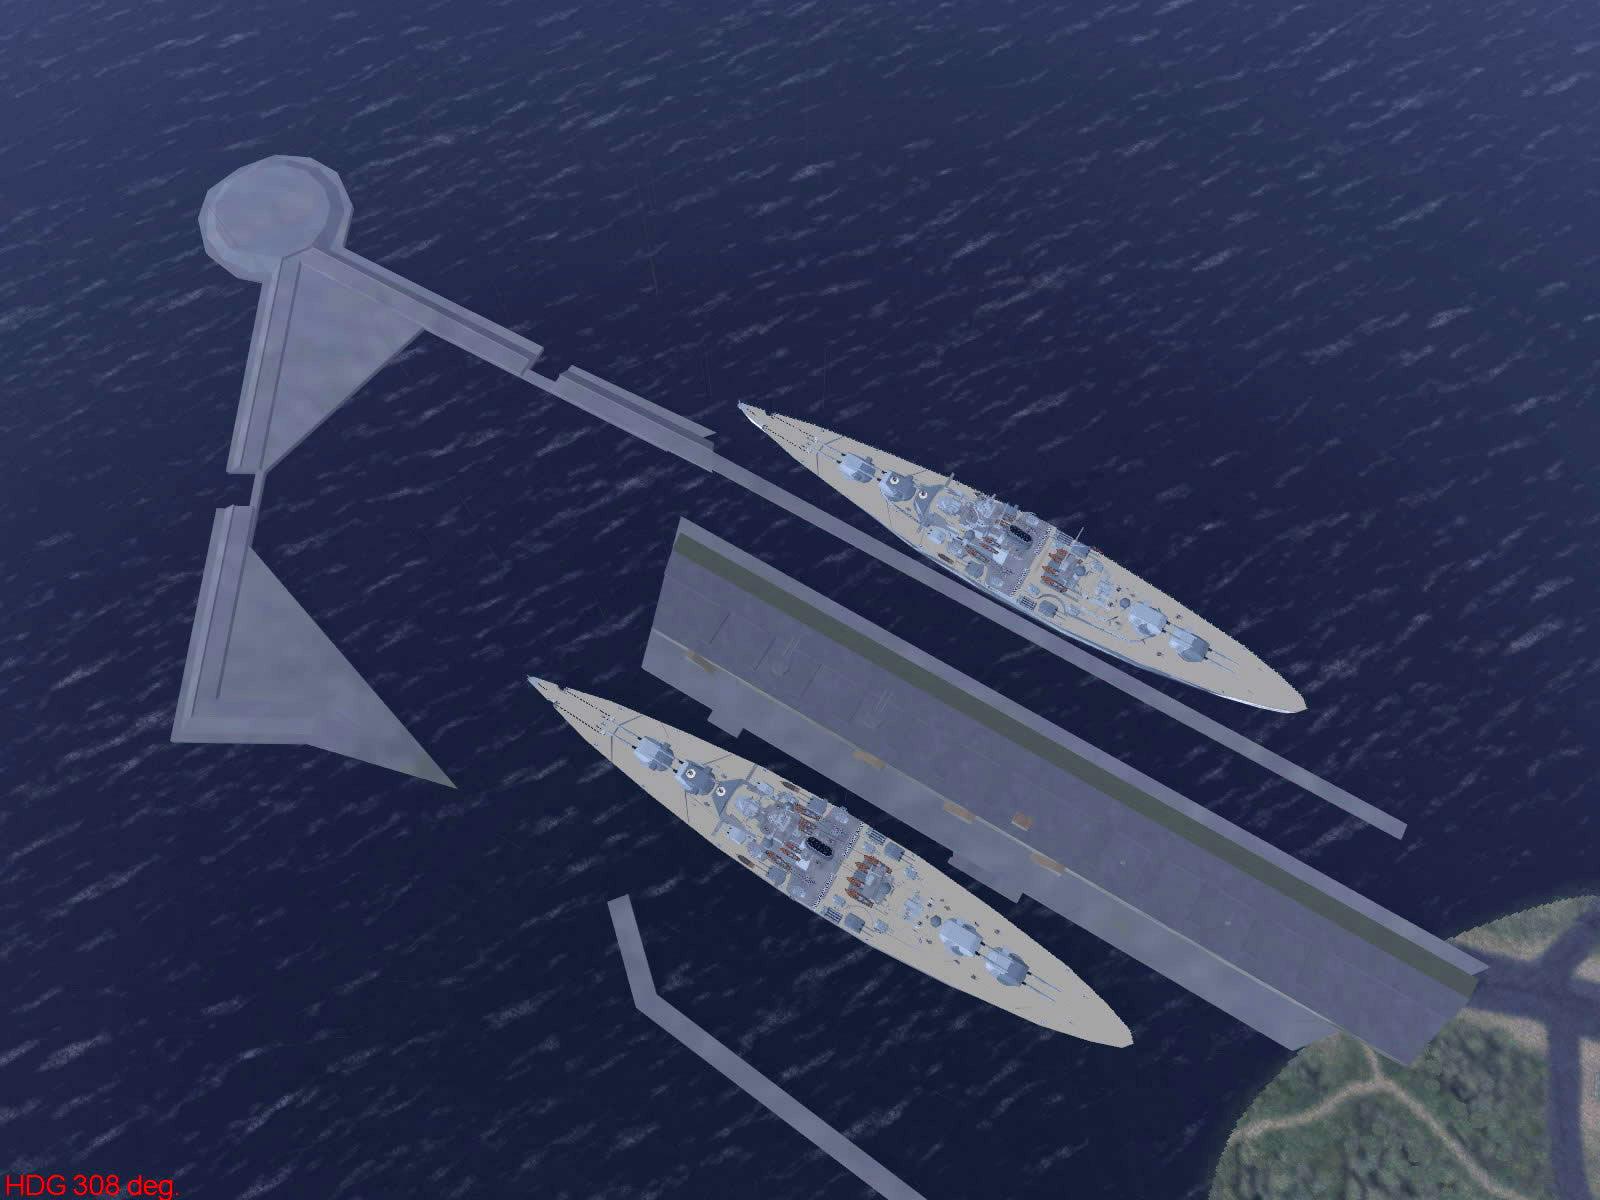 Ubisoft IL2 Sturmovik game version of harbor objets 01